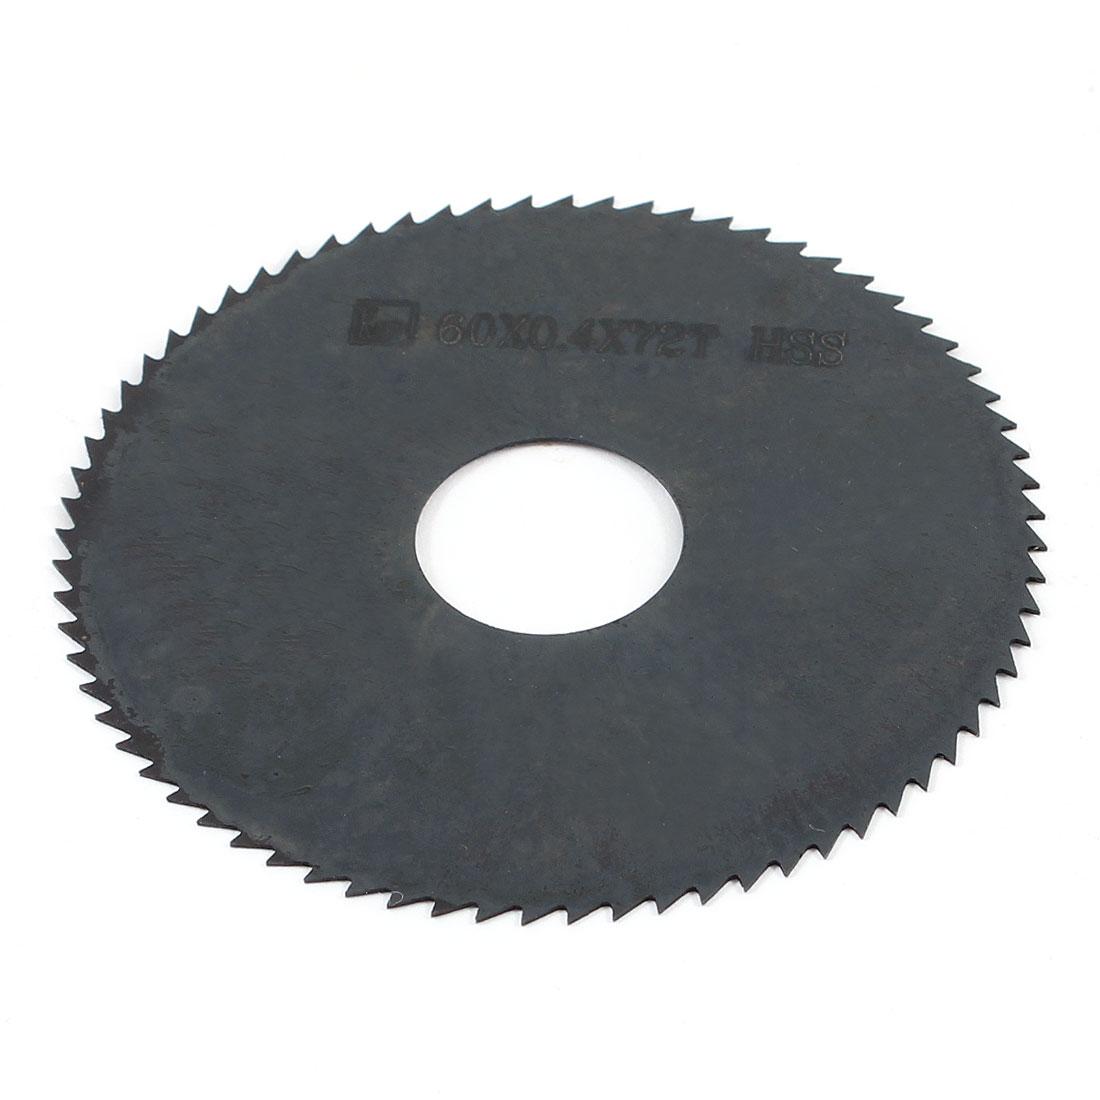 Hand Tool 60mm x 16mm x 0.4mm 72 Peg Teeth HSS Slitting Saw Cutter